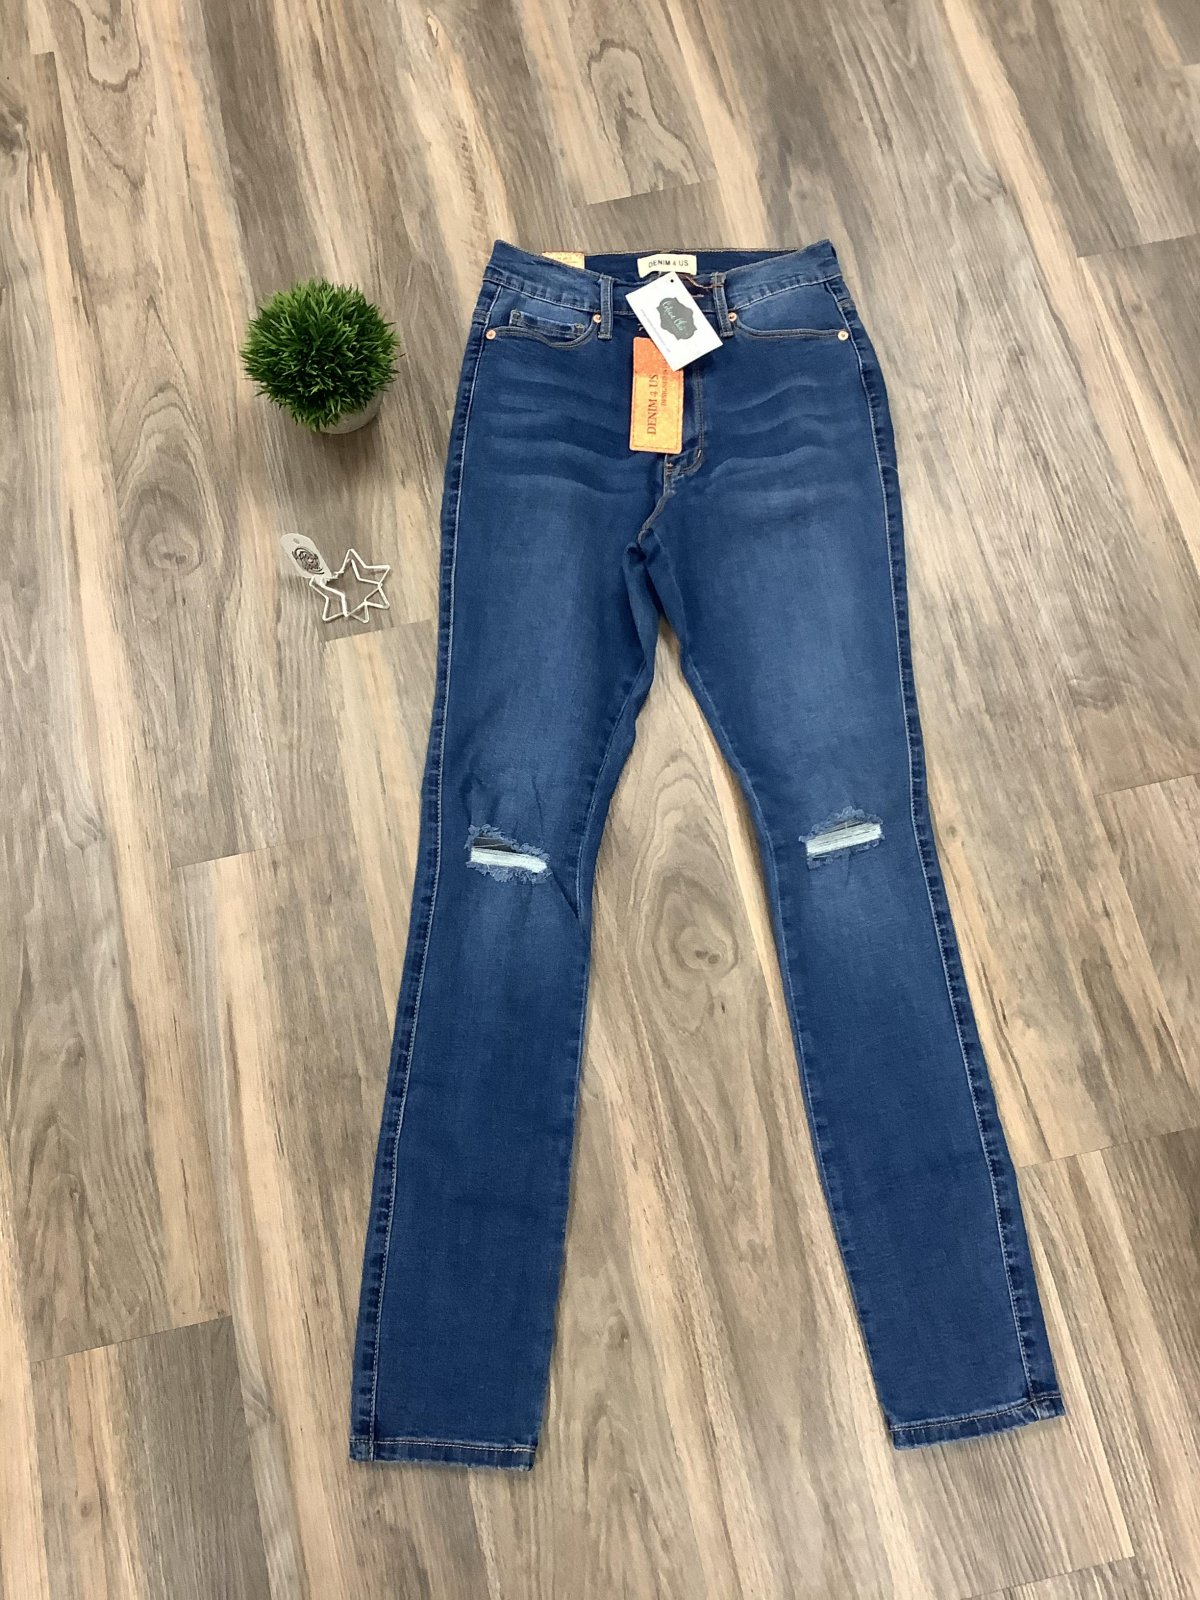 Denim 4 US Distressed High Rise Skinny Jeans